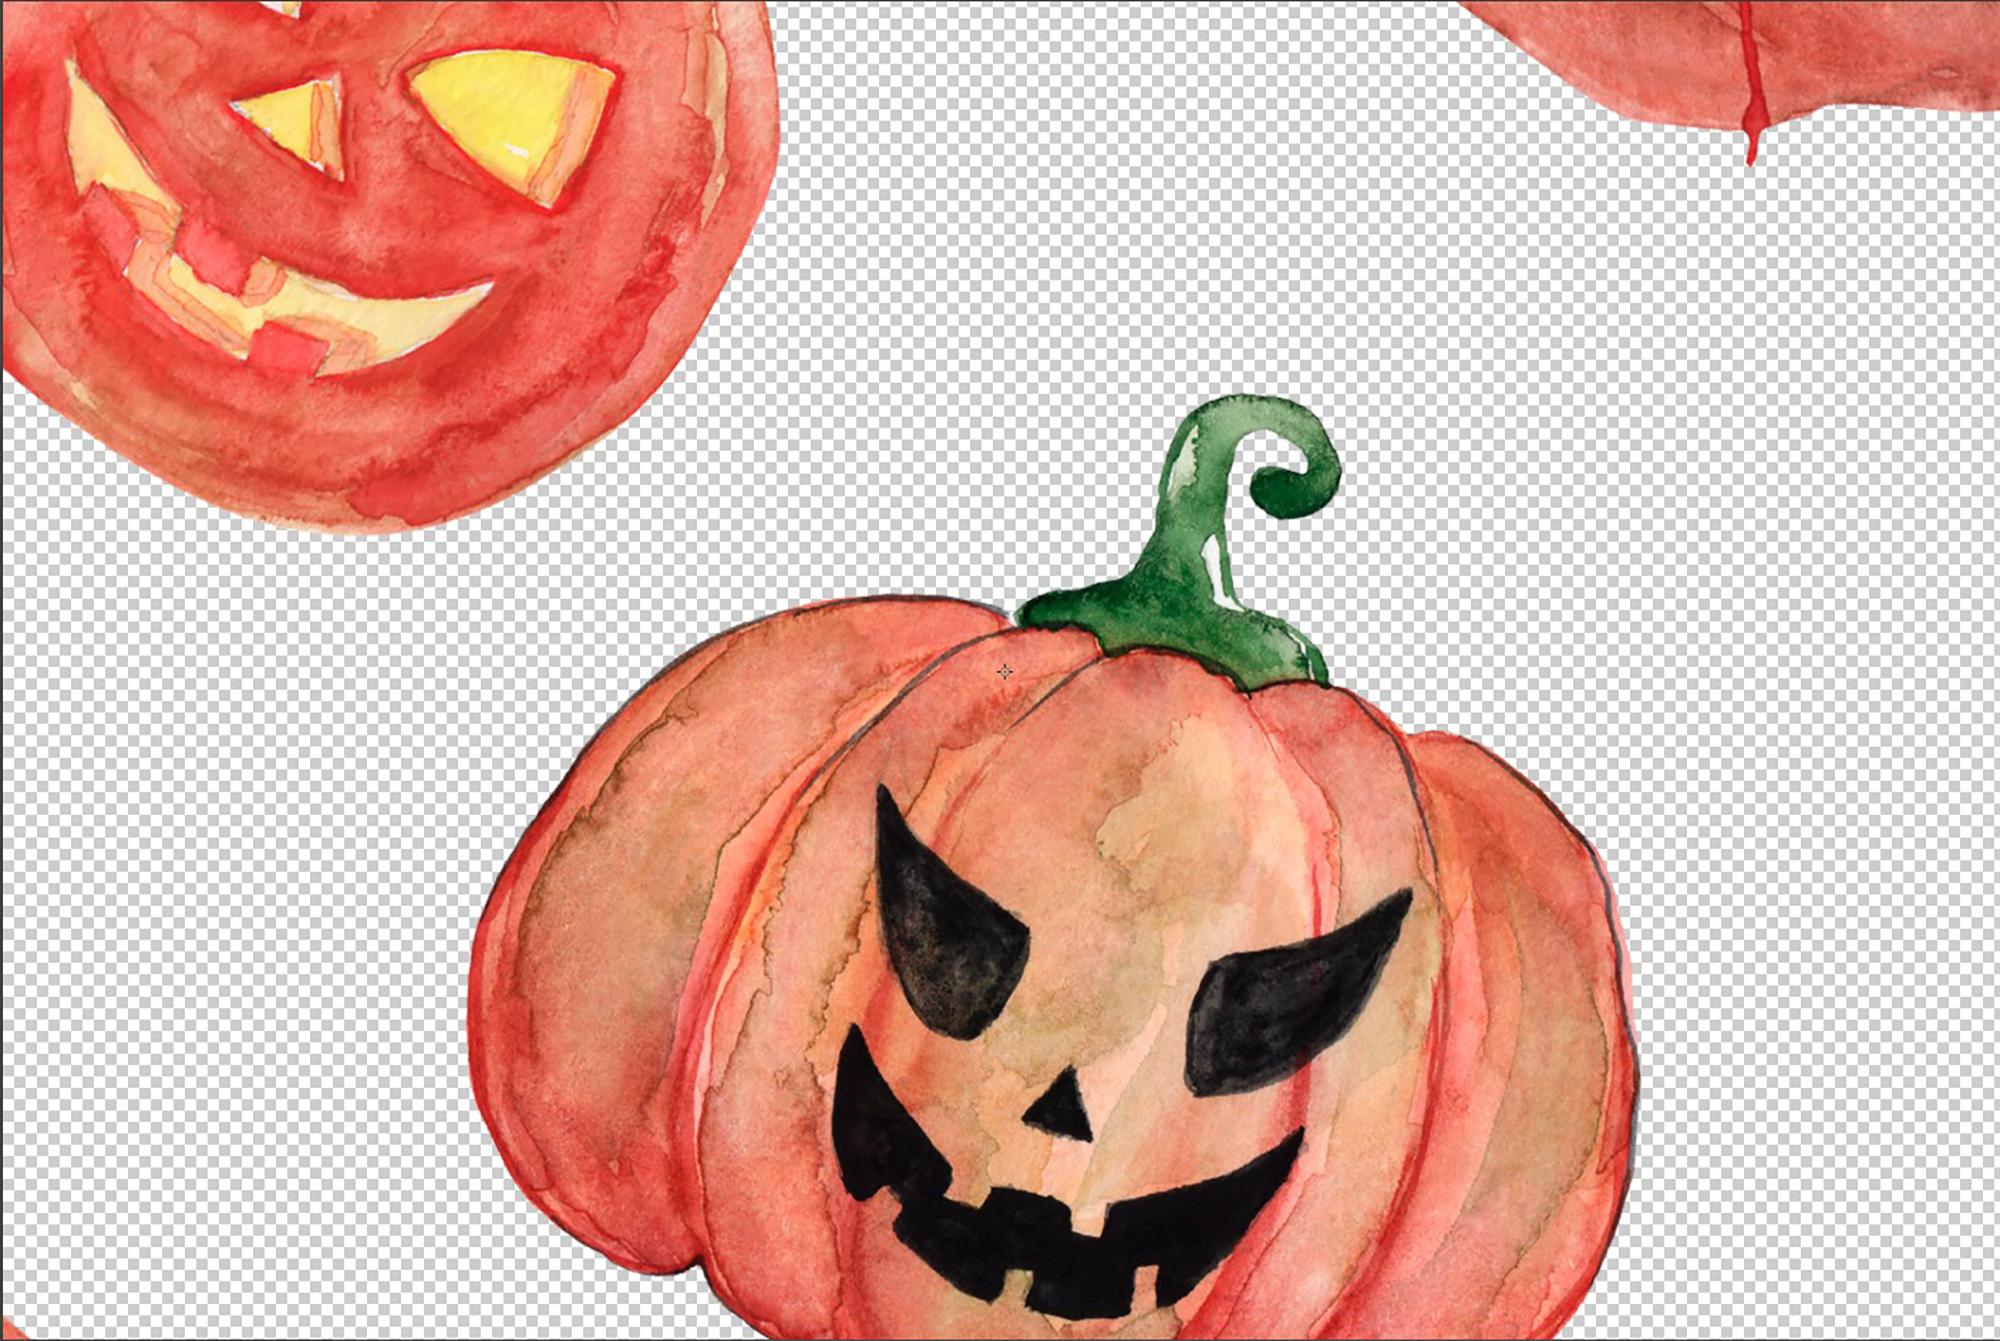 Watercolor Clipart Halloween Bundles with Bats Pumpkins example image 2